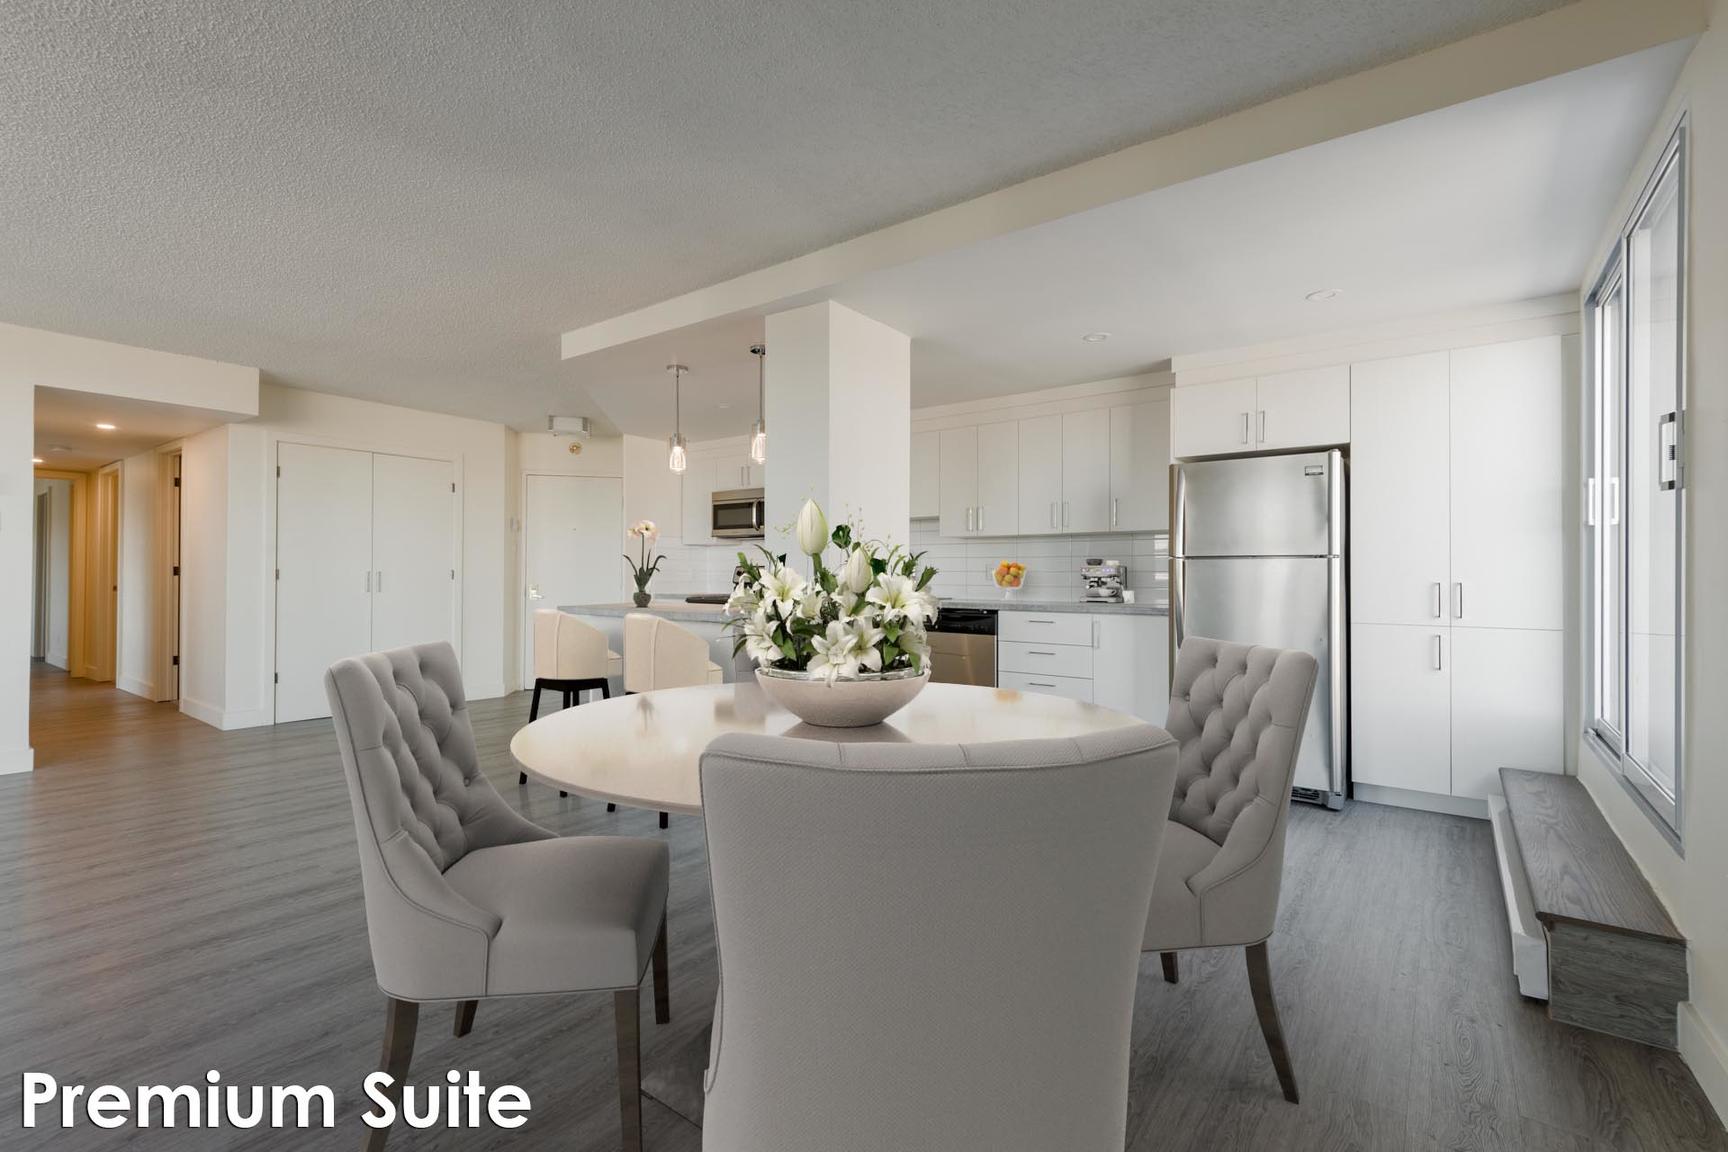 1 bedroom Apartments for rent in Ville St-Laurent - Bois-Franc at Complexe Deguire - Photo 09 - RentQuebecApartments – L407181